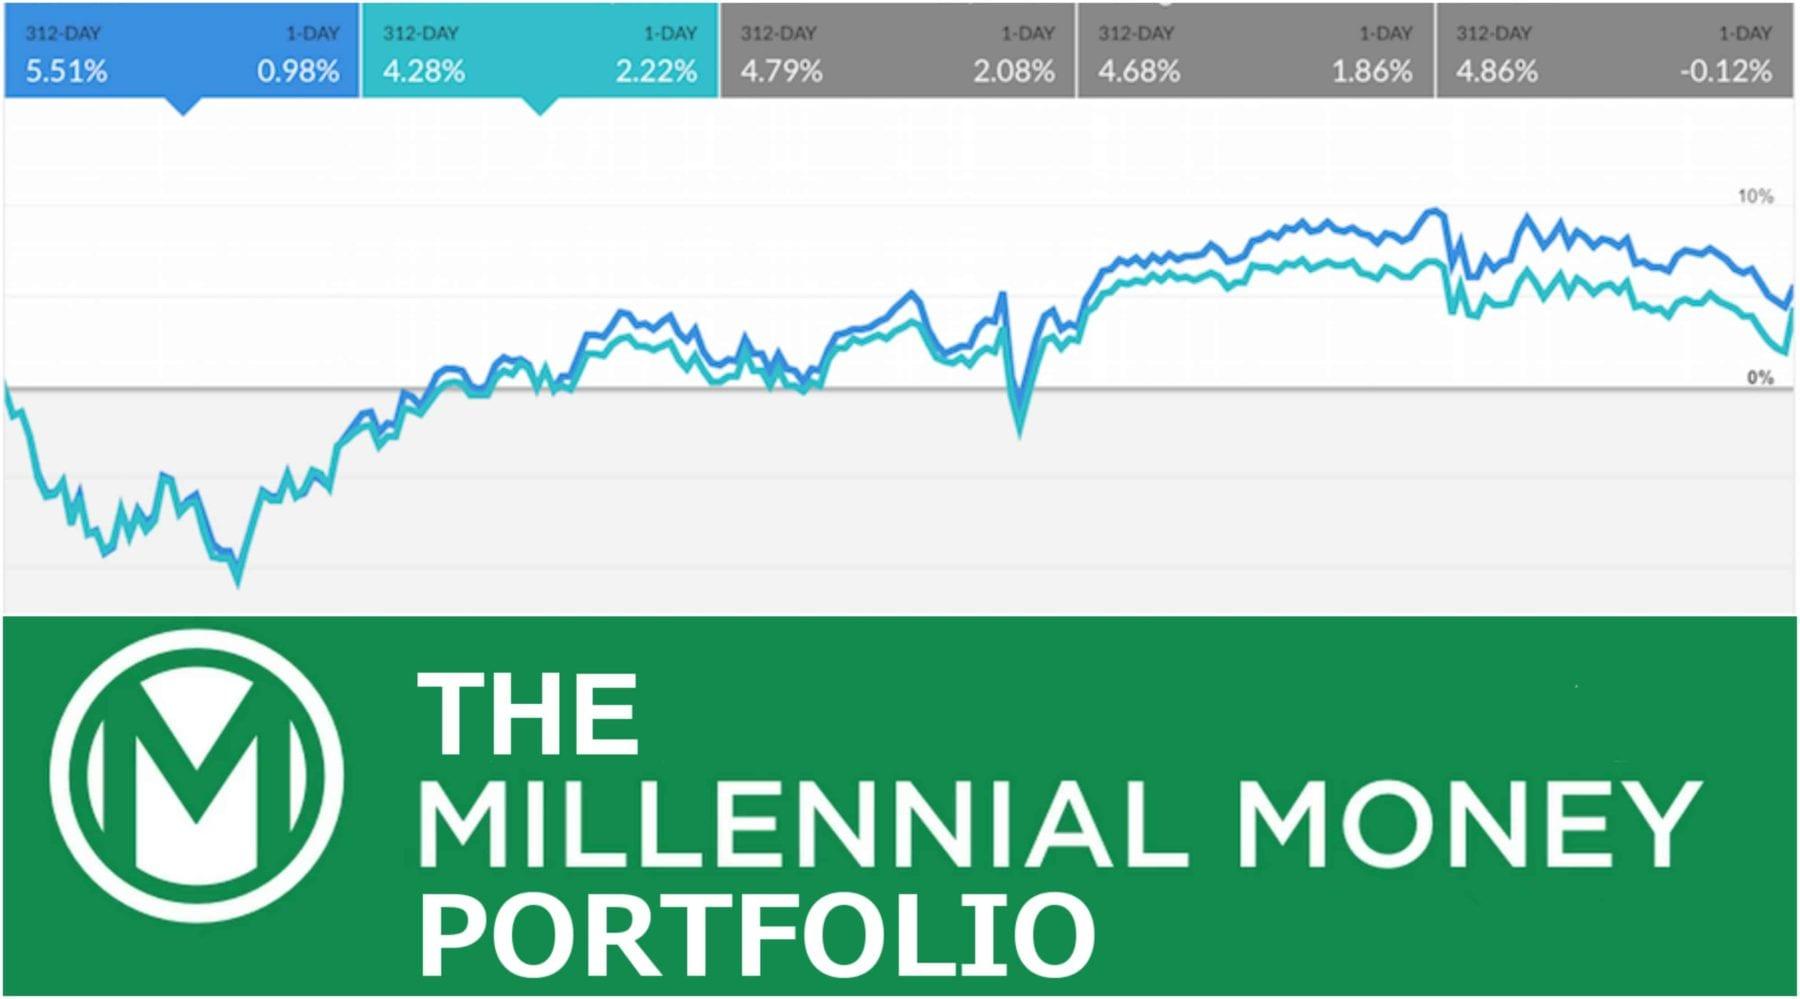 I'm Lazy and Beat The Stock Market | Millenial's Best Stock Portfolio